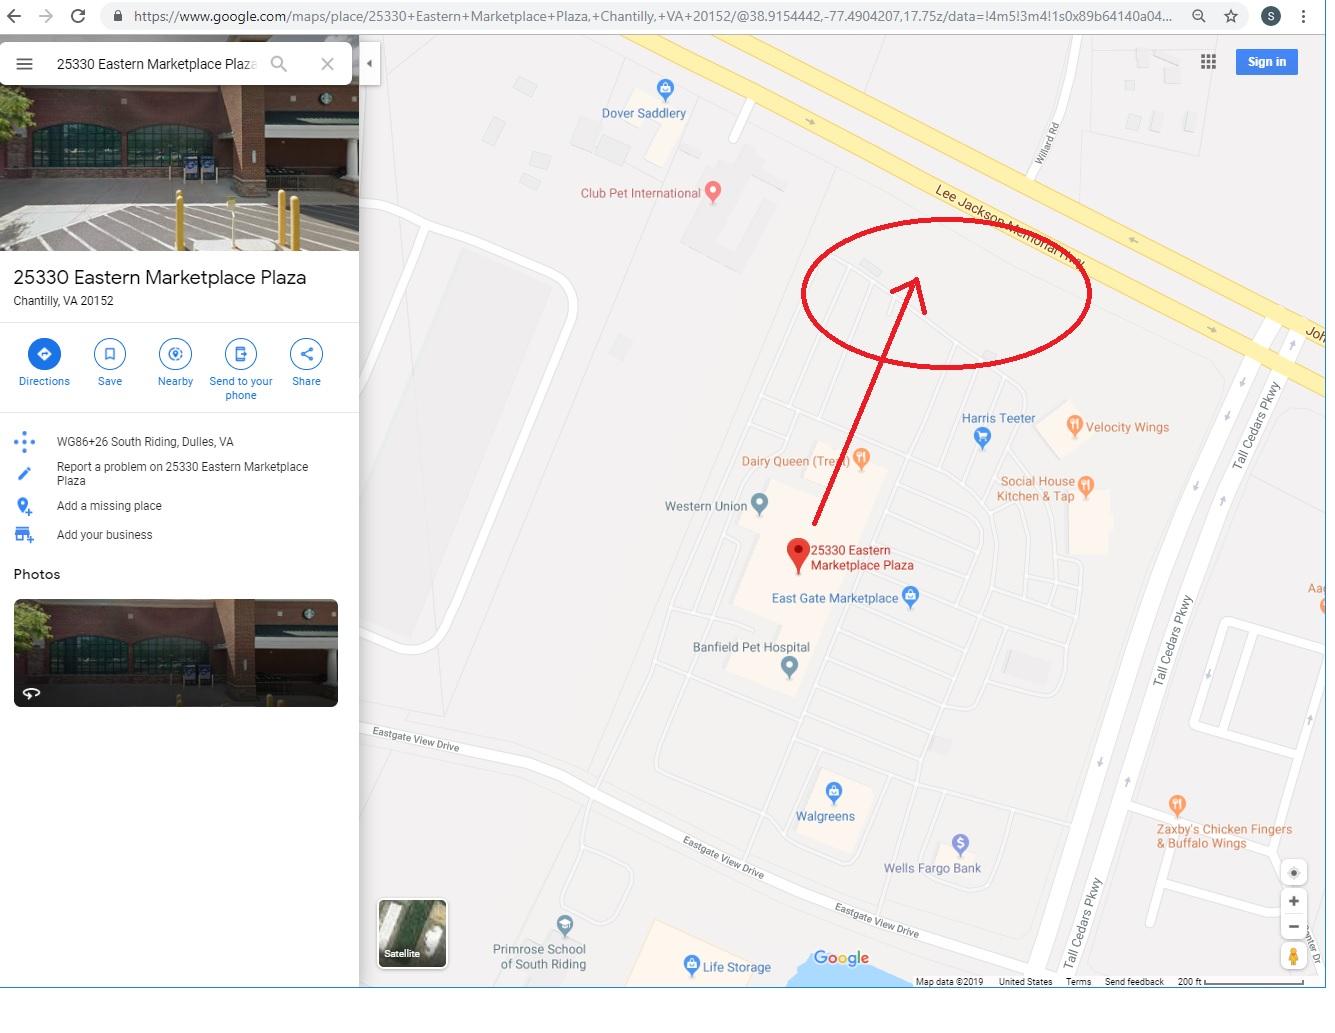 New construction address was wrong. please fix it. - Google ... on culpeper county map, whitestone map, idylwood va map, san diego va map, hamilton va map, fairfax county map, ft a.p. hill map, jefferson va map, baltimore va map, capitol heights va map, random hills va map, tucson va map, charles town va map, woodbridge va map, st. mary's grand lake map, tyson's corner va map, westmoreland state park va map, aquia va map, middle river va map, baileys crossroads va map,